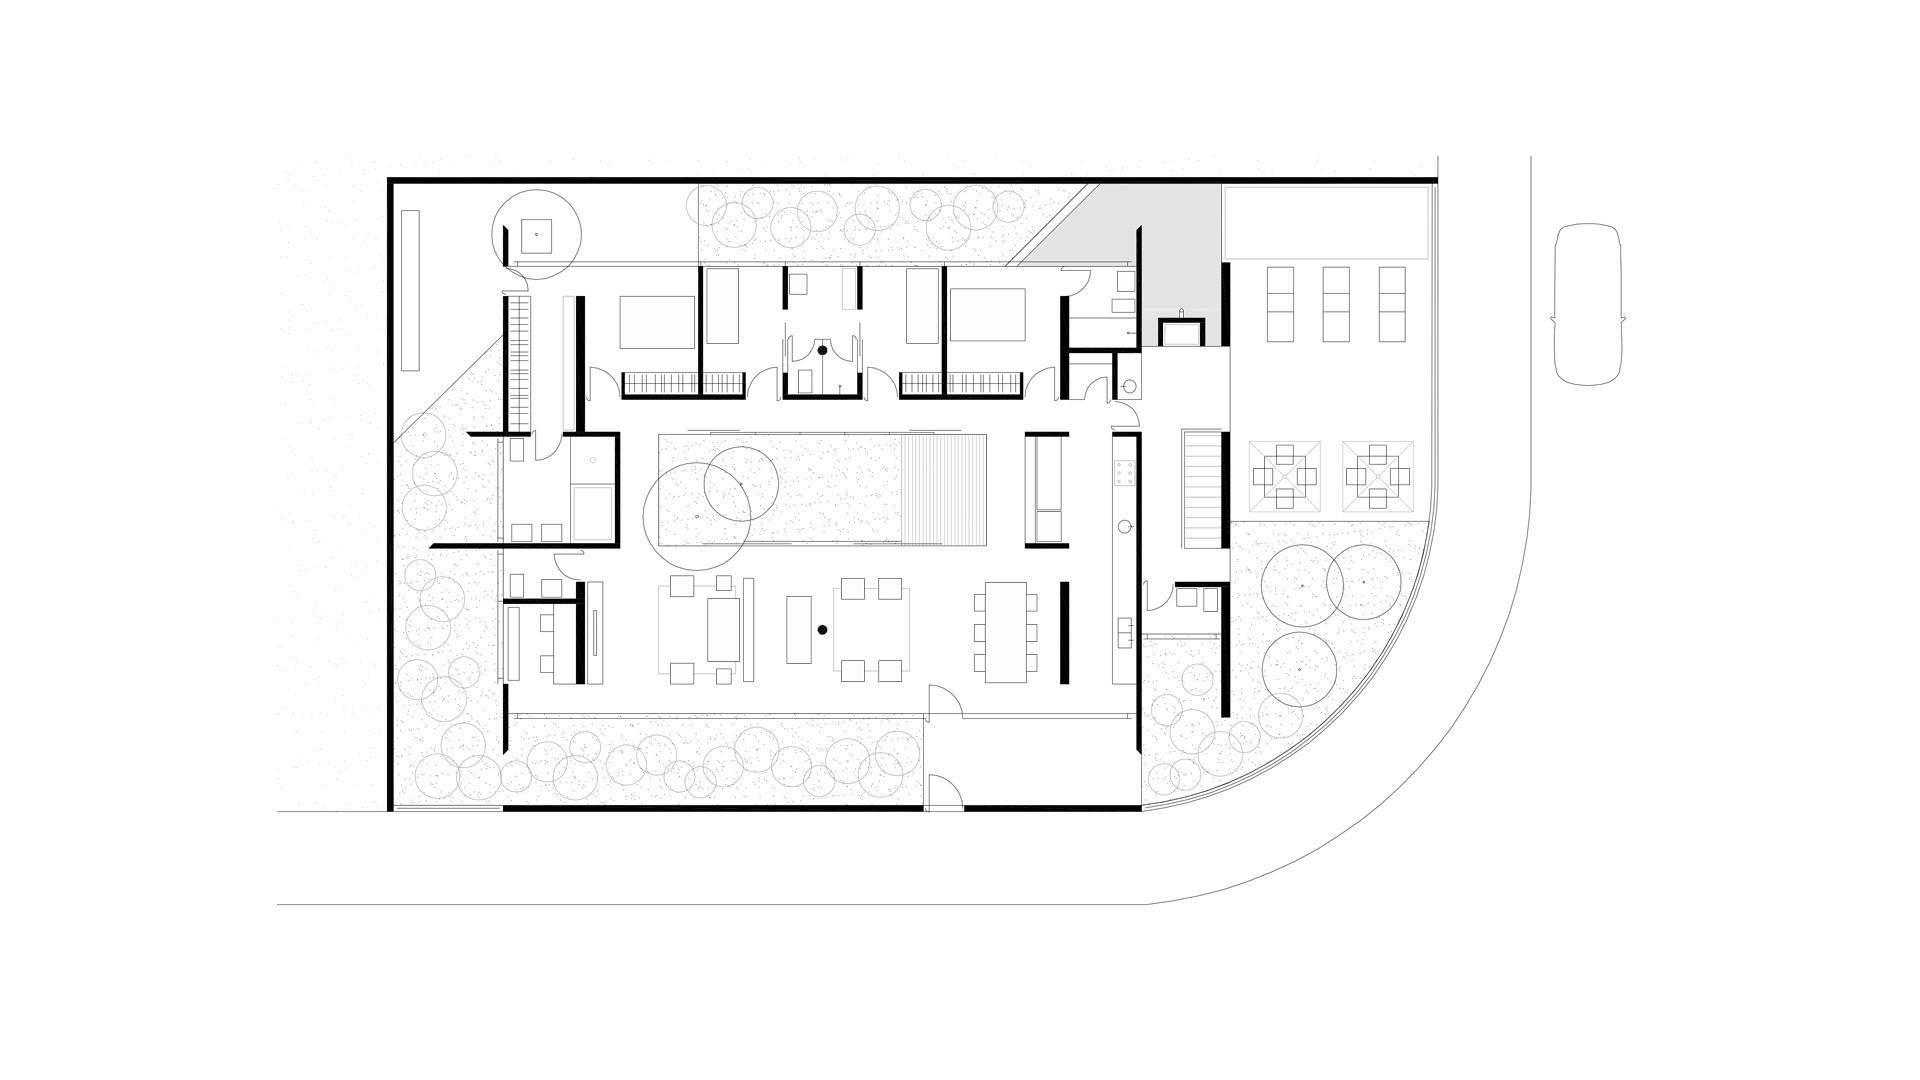 residencia-jundiai-planta-pav-terreo